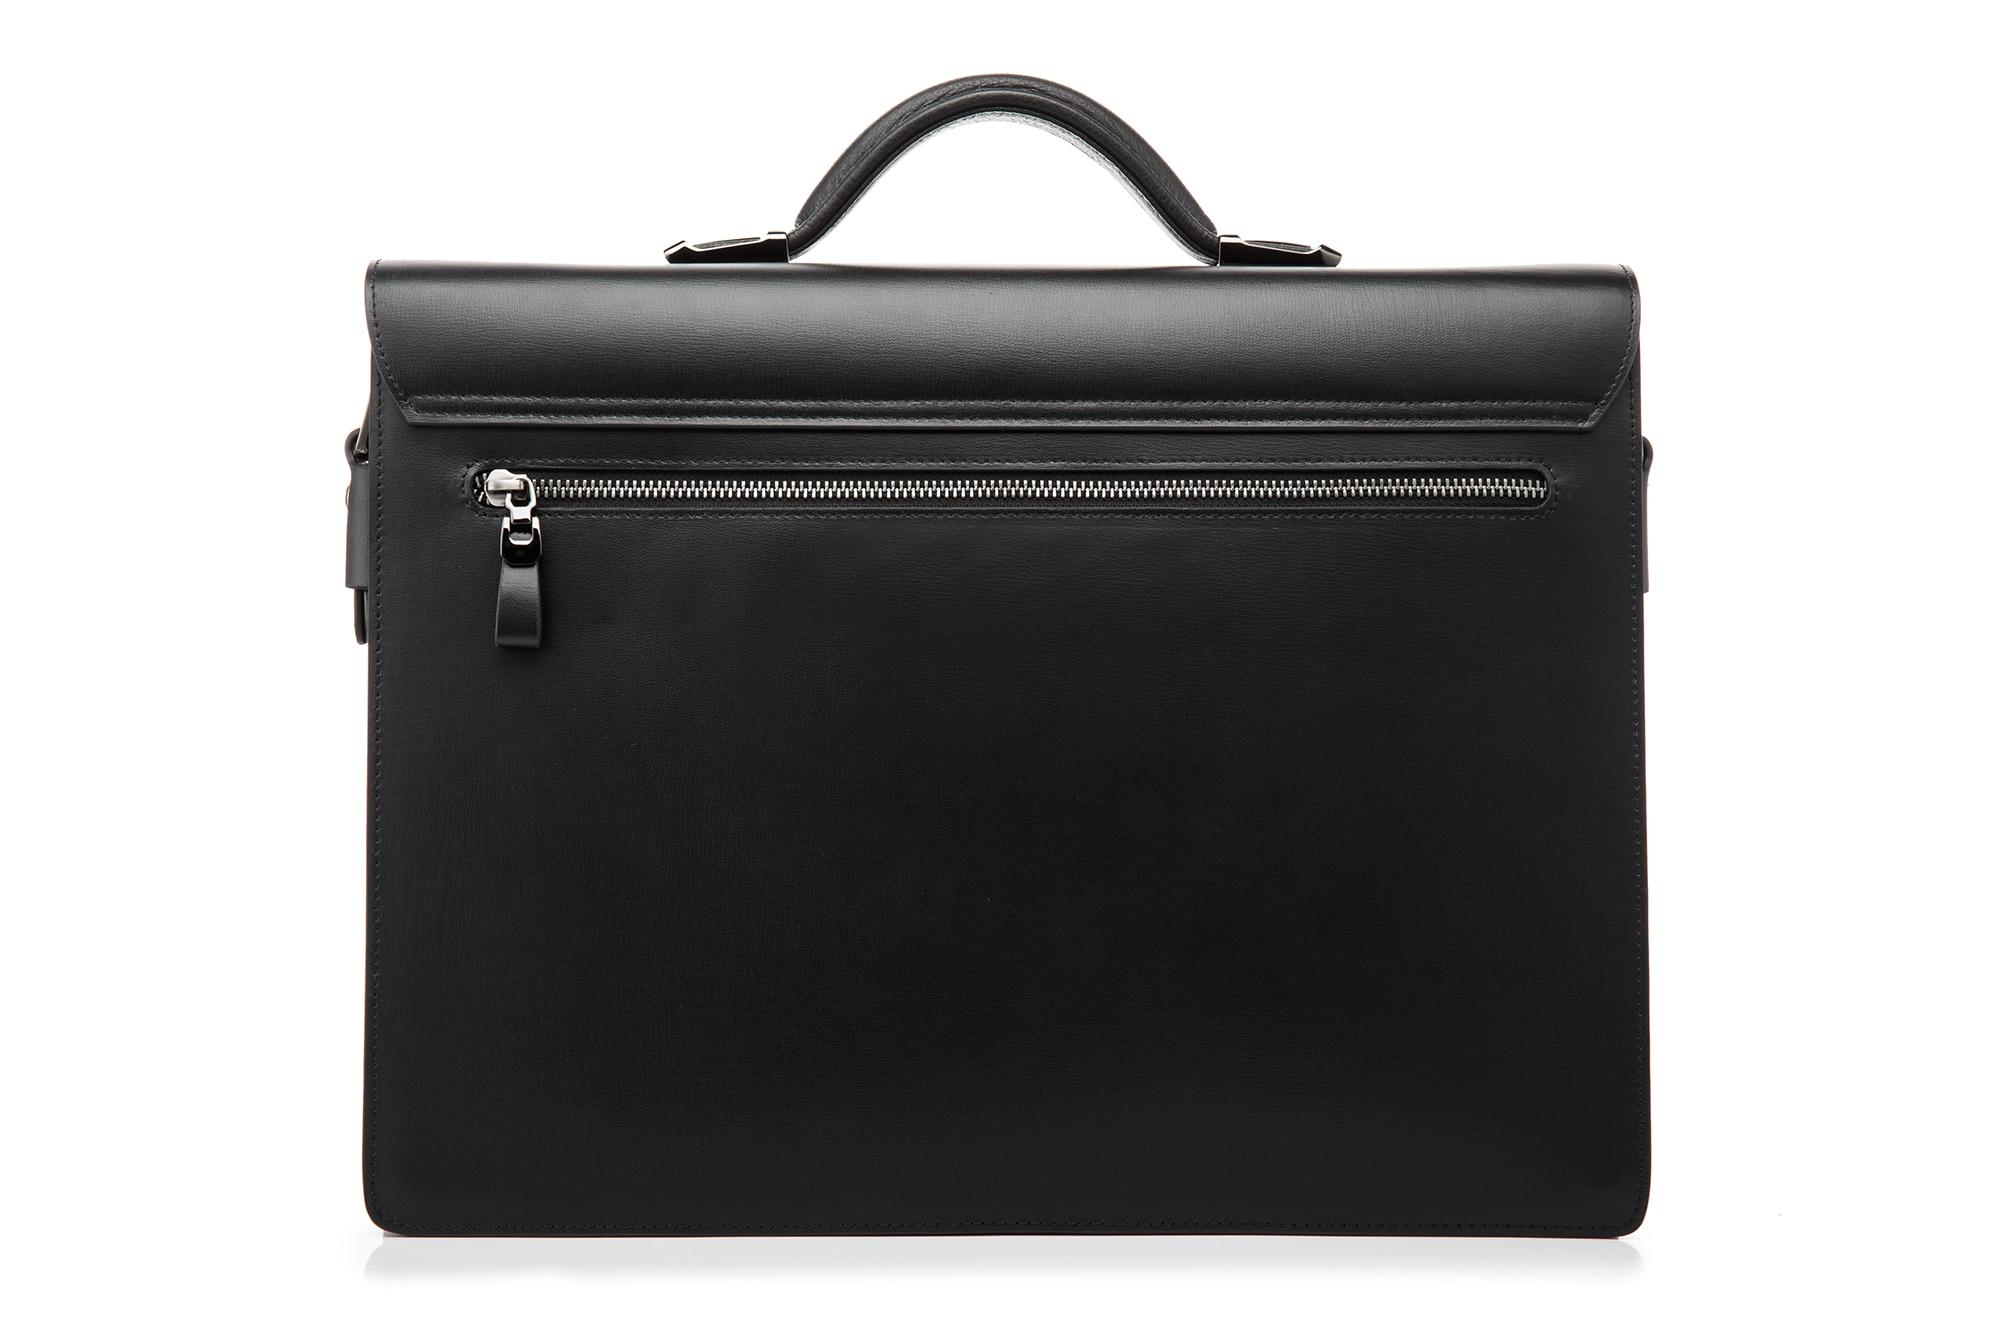 Yinte Anwalt Schwarz Und 6 Attache Schulter Tasche Totes Fall Messenger Dicker Bag Leder Große Männer Black T8191 Aktentasche Business rrq4Ax